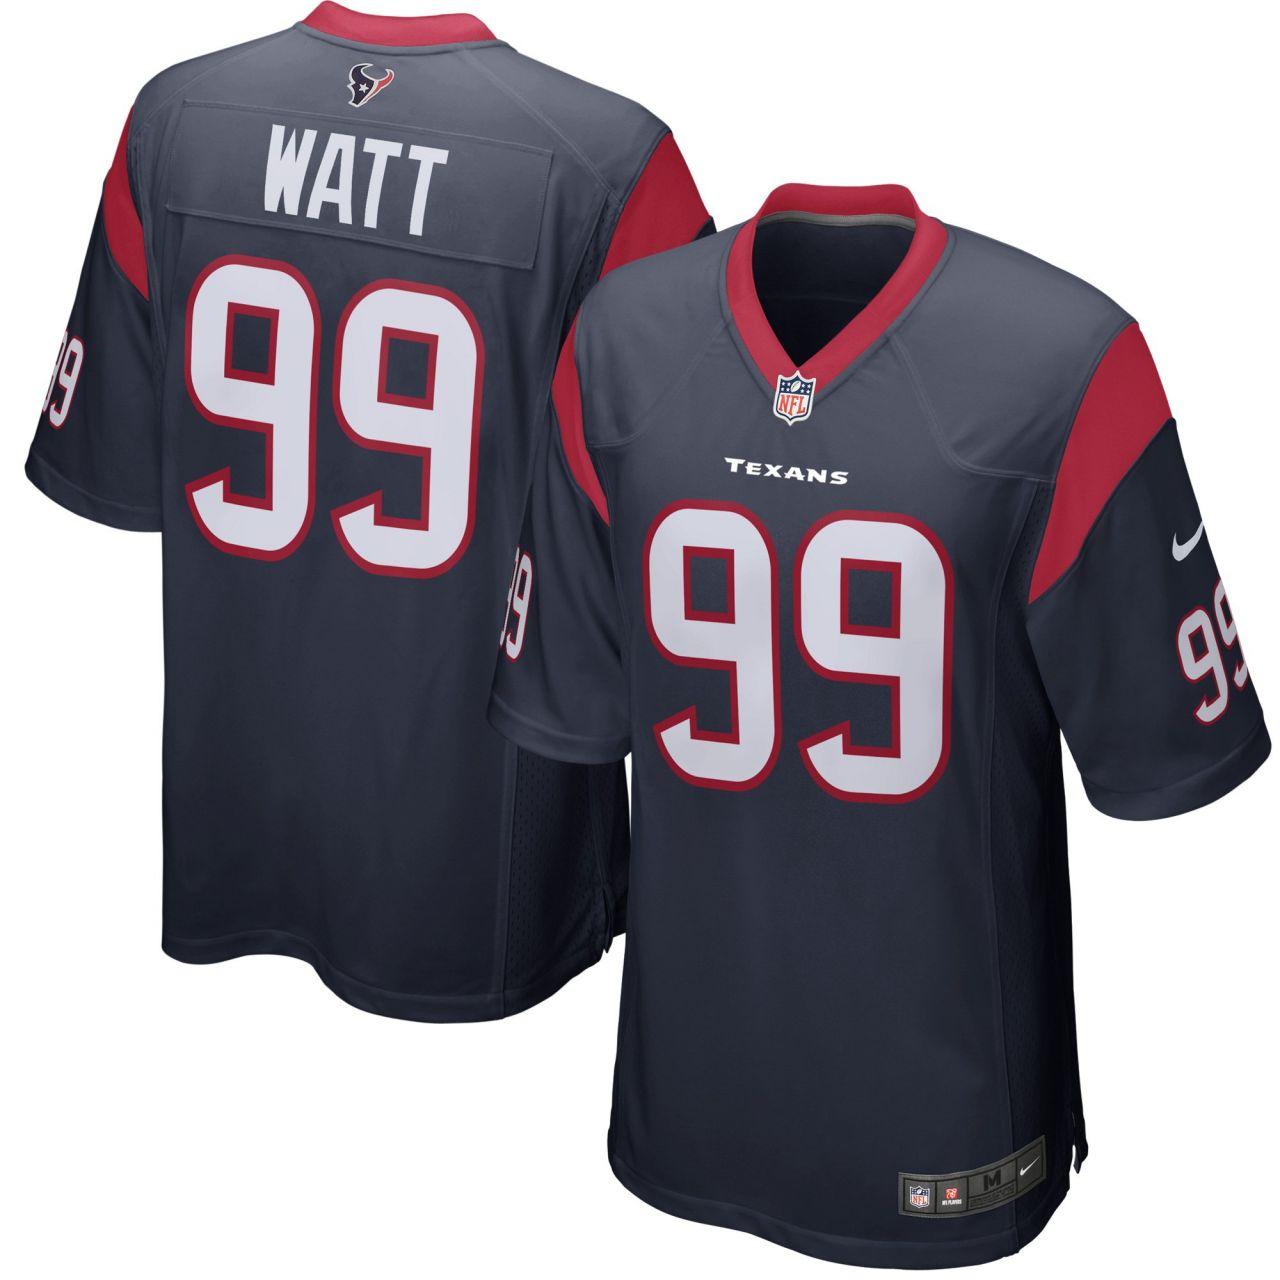 amfoo - Nike GAME Jersey Trikot Houston Texans #99 J. J. Watt